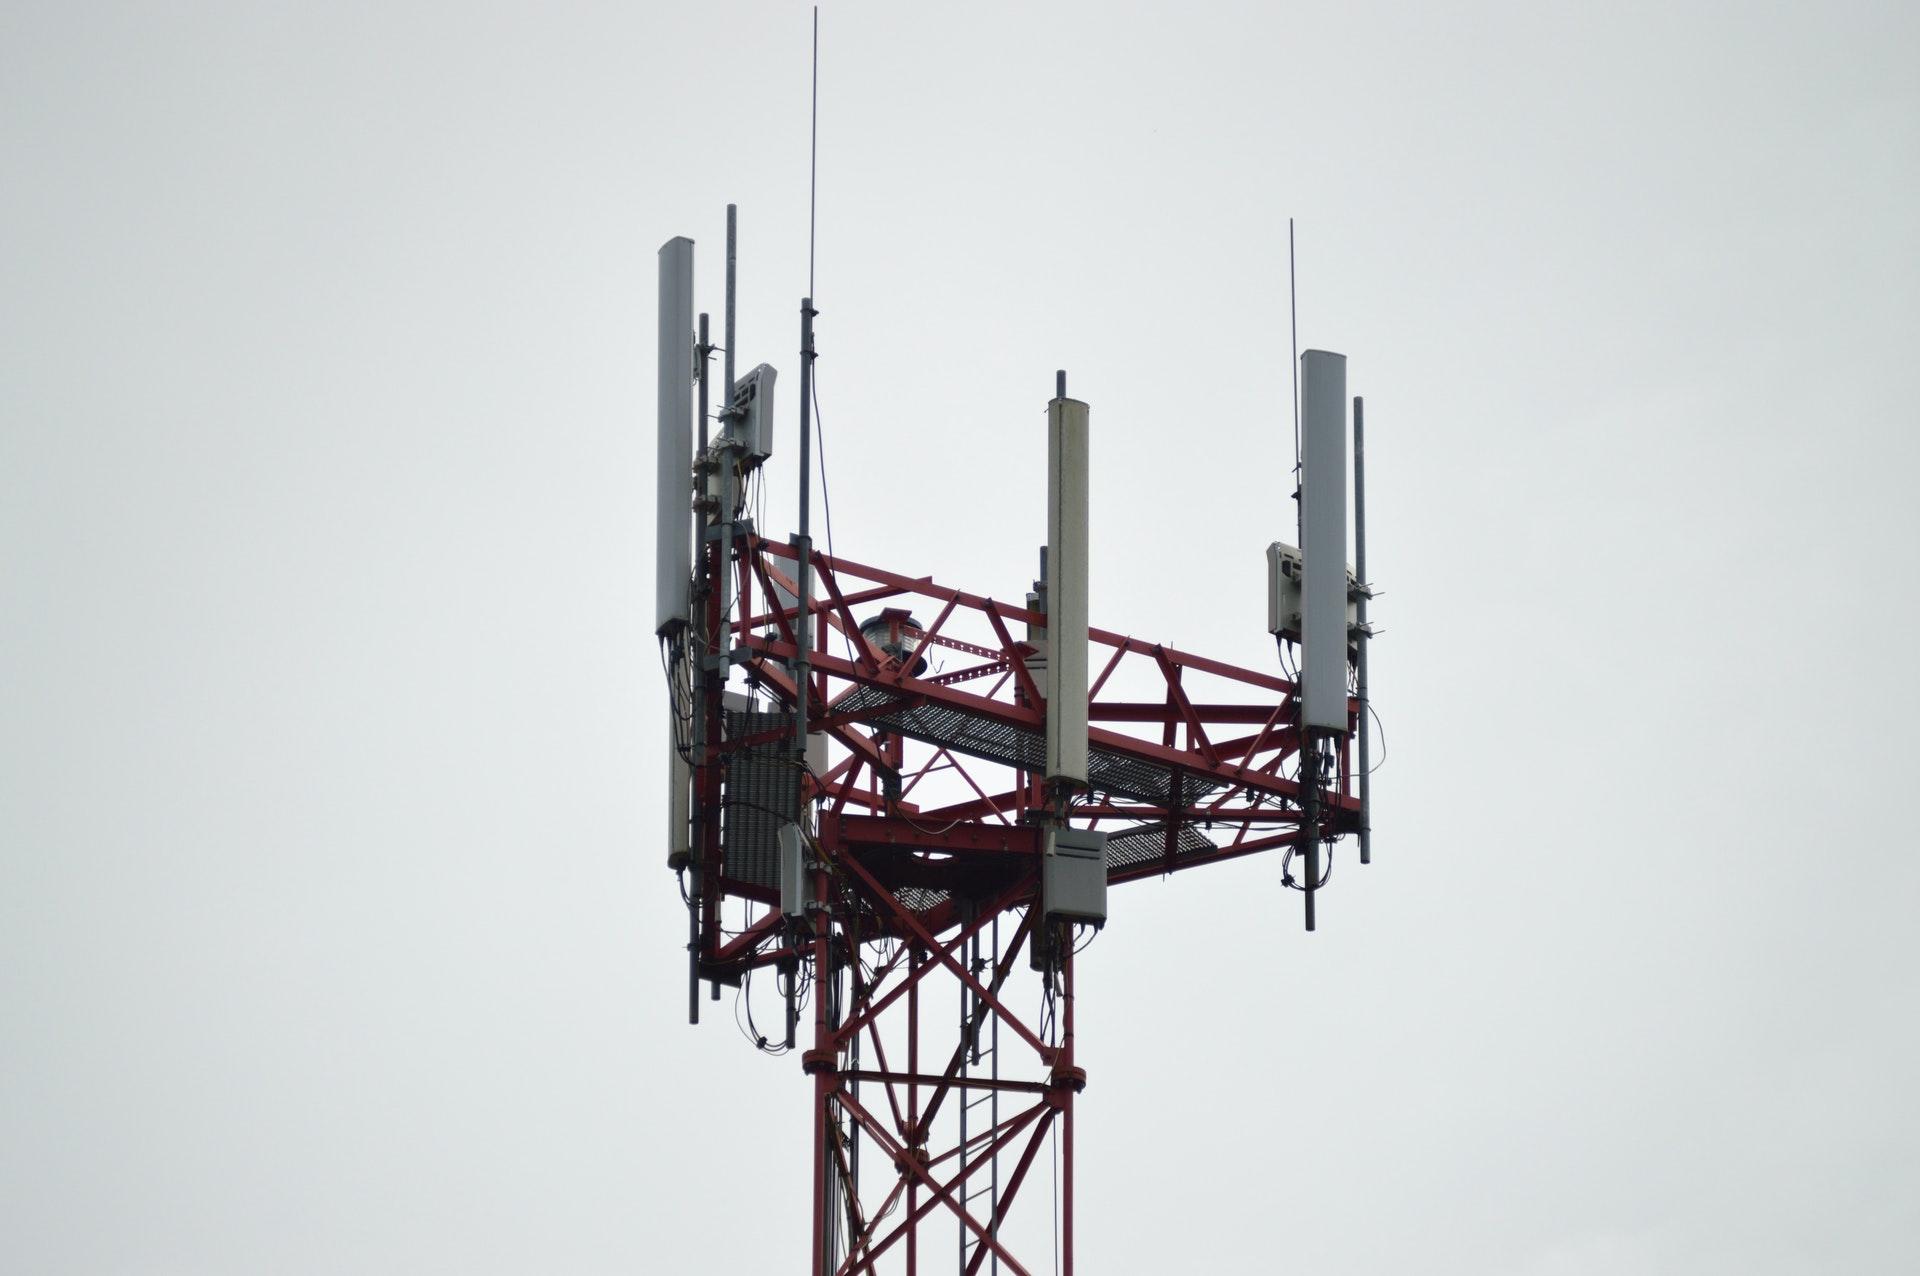 How Does Communication Via Satellite Work?